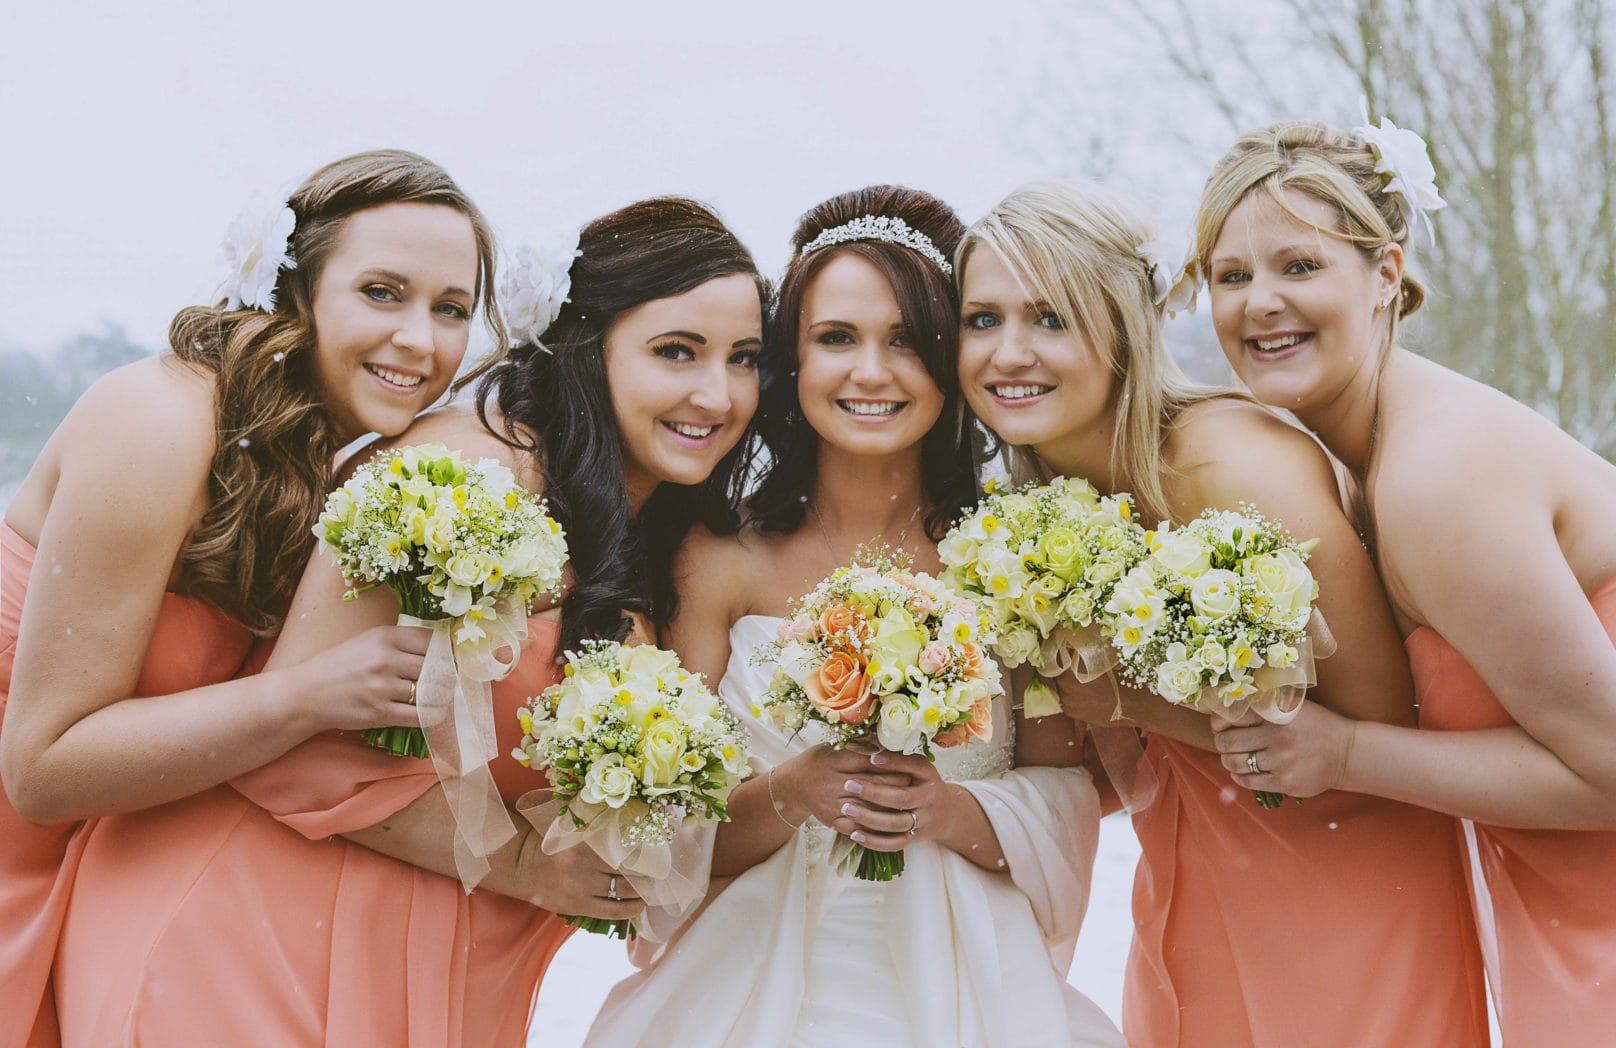 Bride and bridesmaids at winter wedding